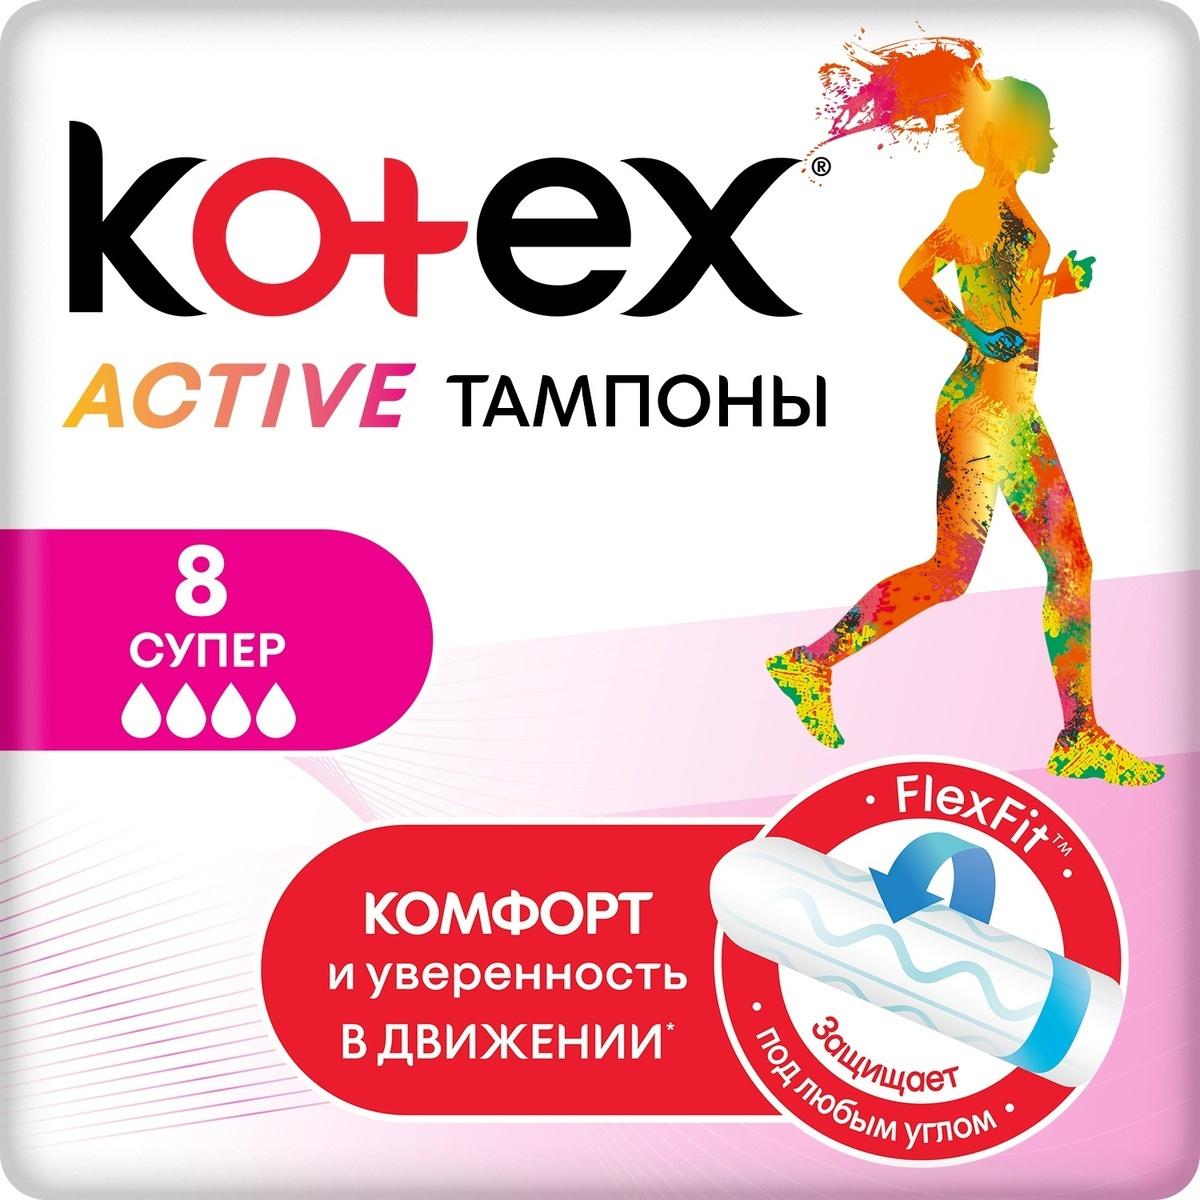 Kotex Тампоны Active Super, 8 шт #1